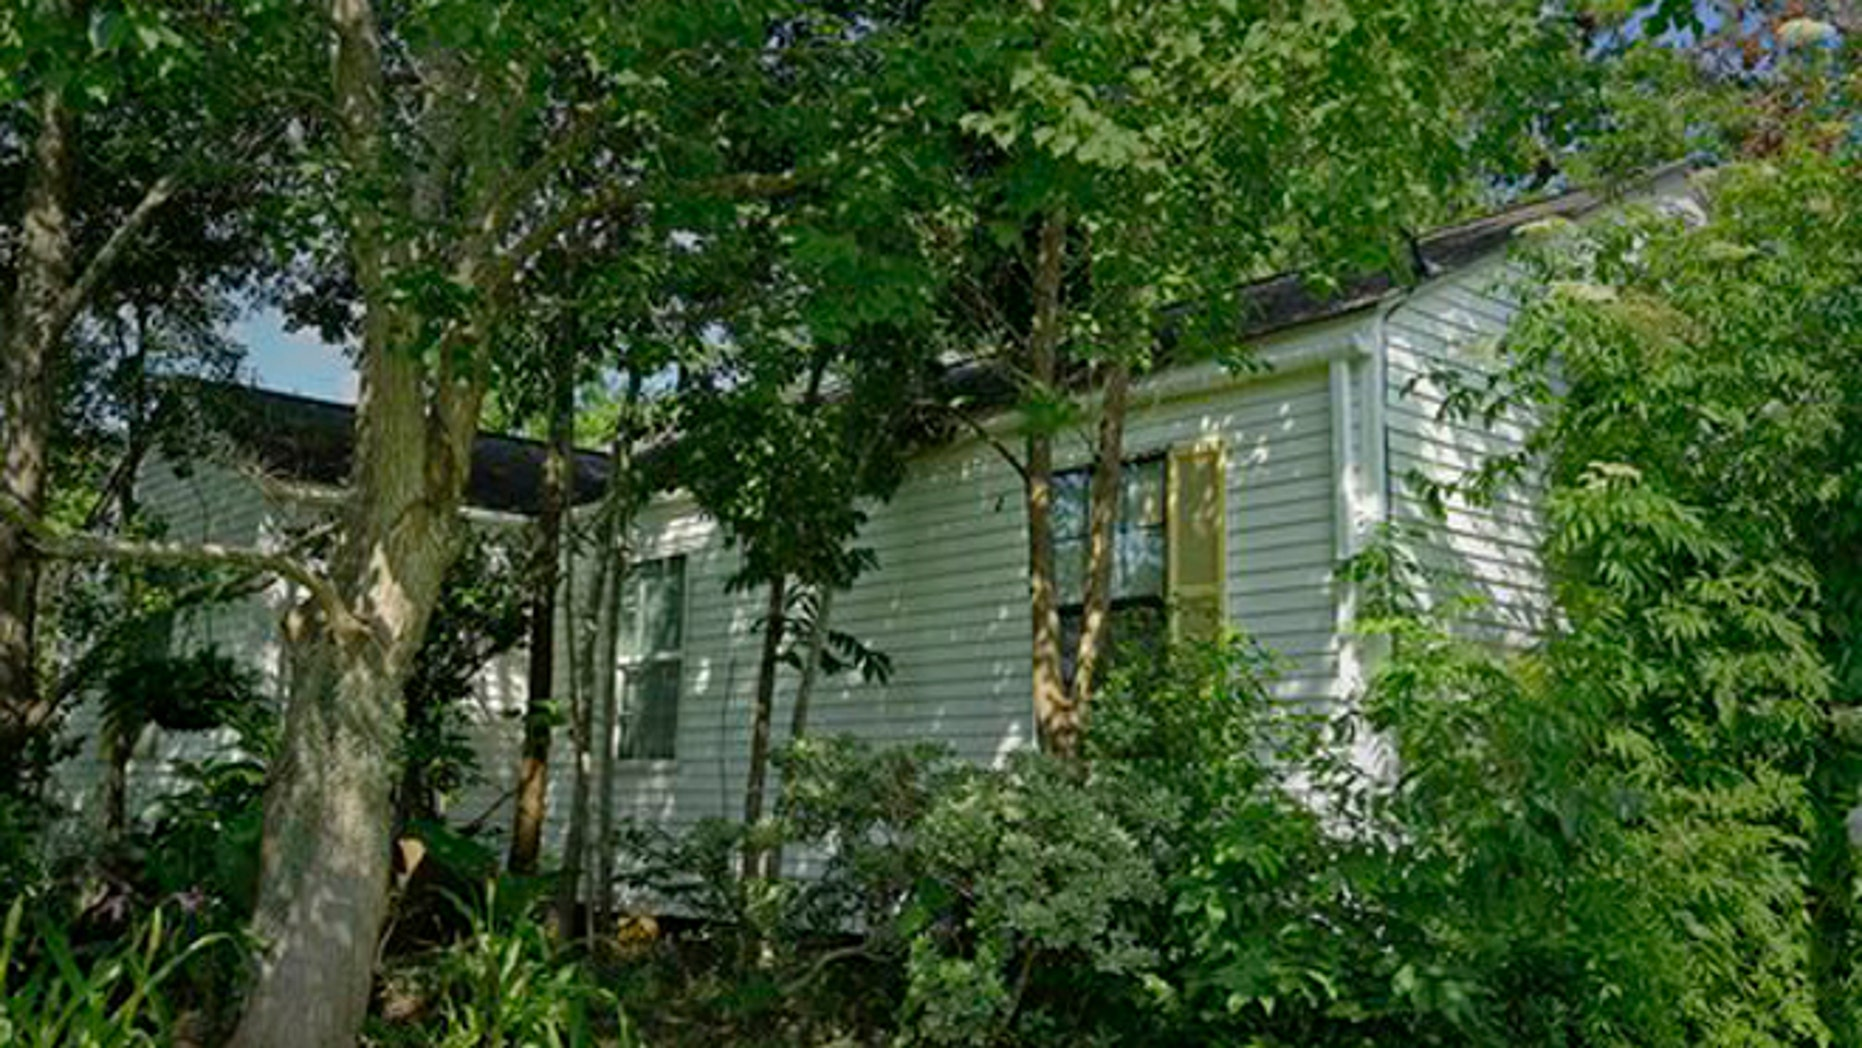 Musician Janis Joplin's childhood home on 32nd Street in Port Arthur, Texas is seen in an Monday, June 6, 2016 photo.